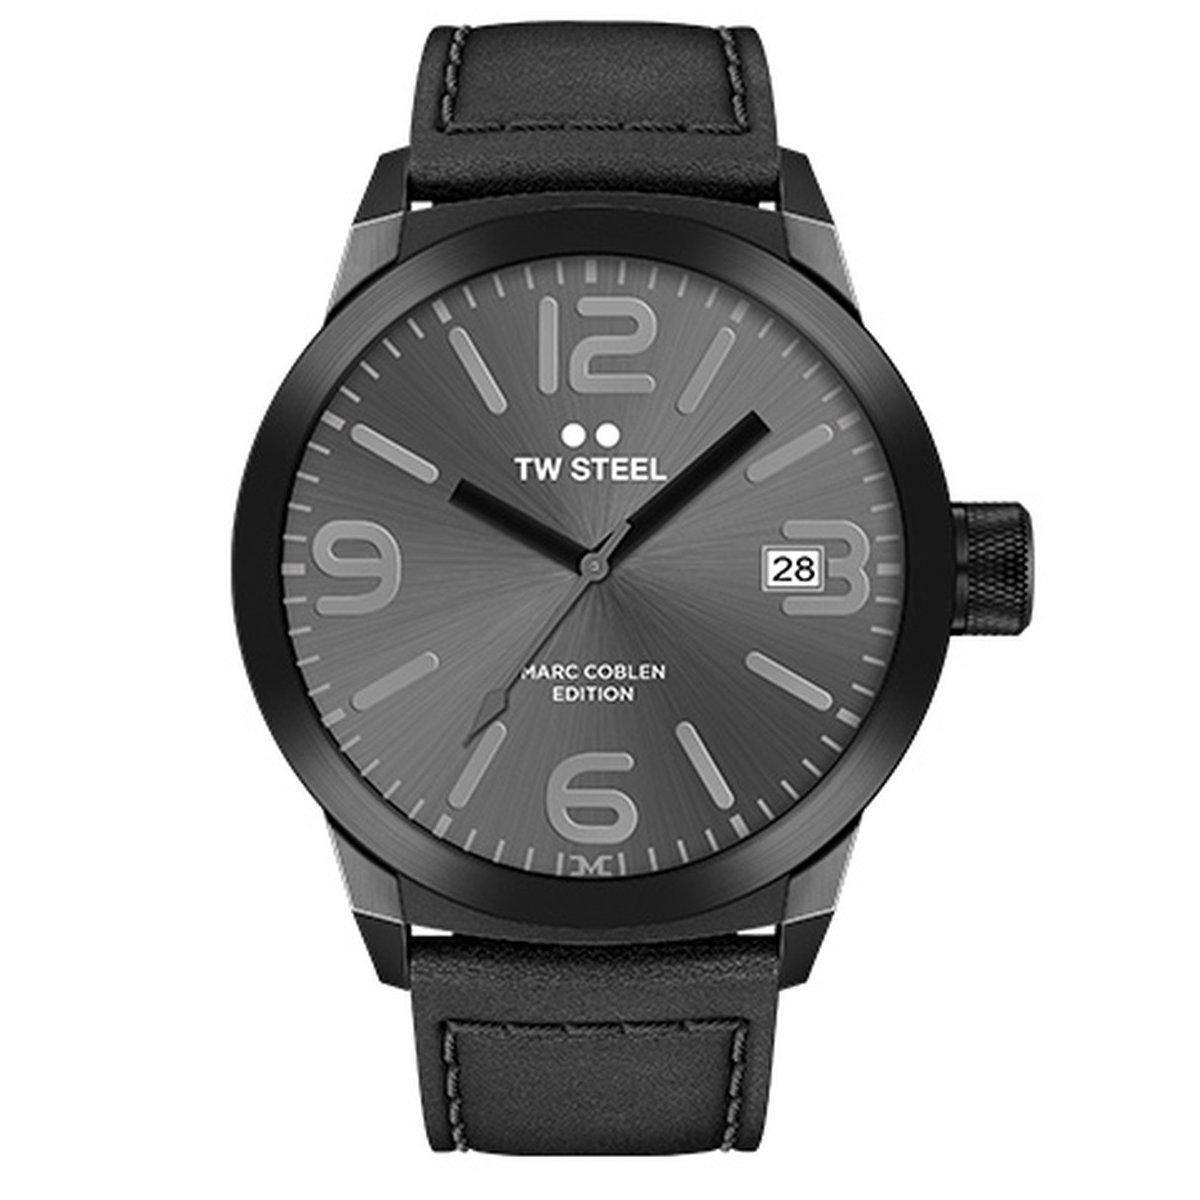 tw steel herren uhr armbanduhr marc coblen edition twmc53. Black Bedroom Furniture Sets. Home Design Ideas